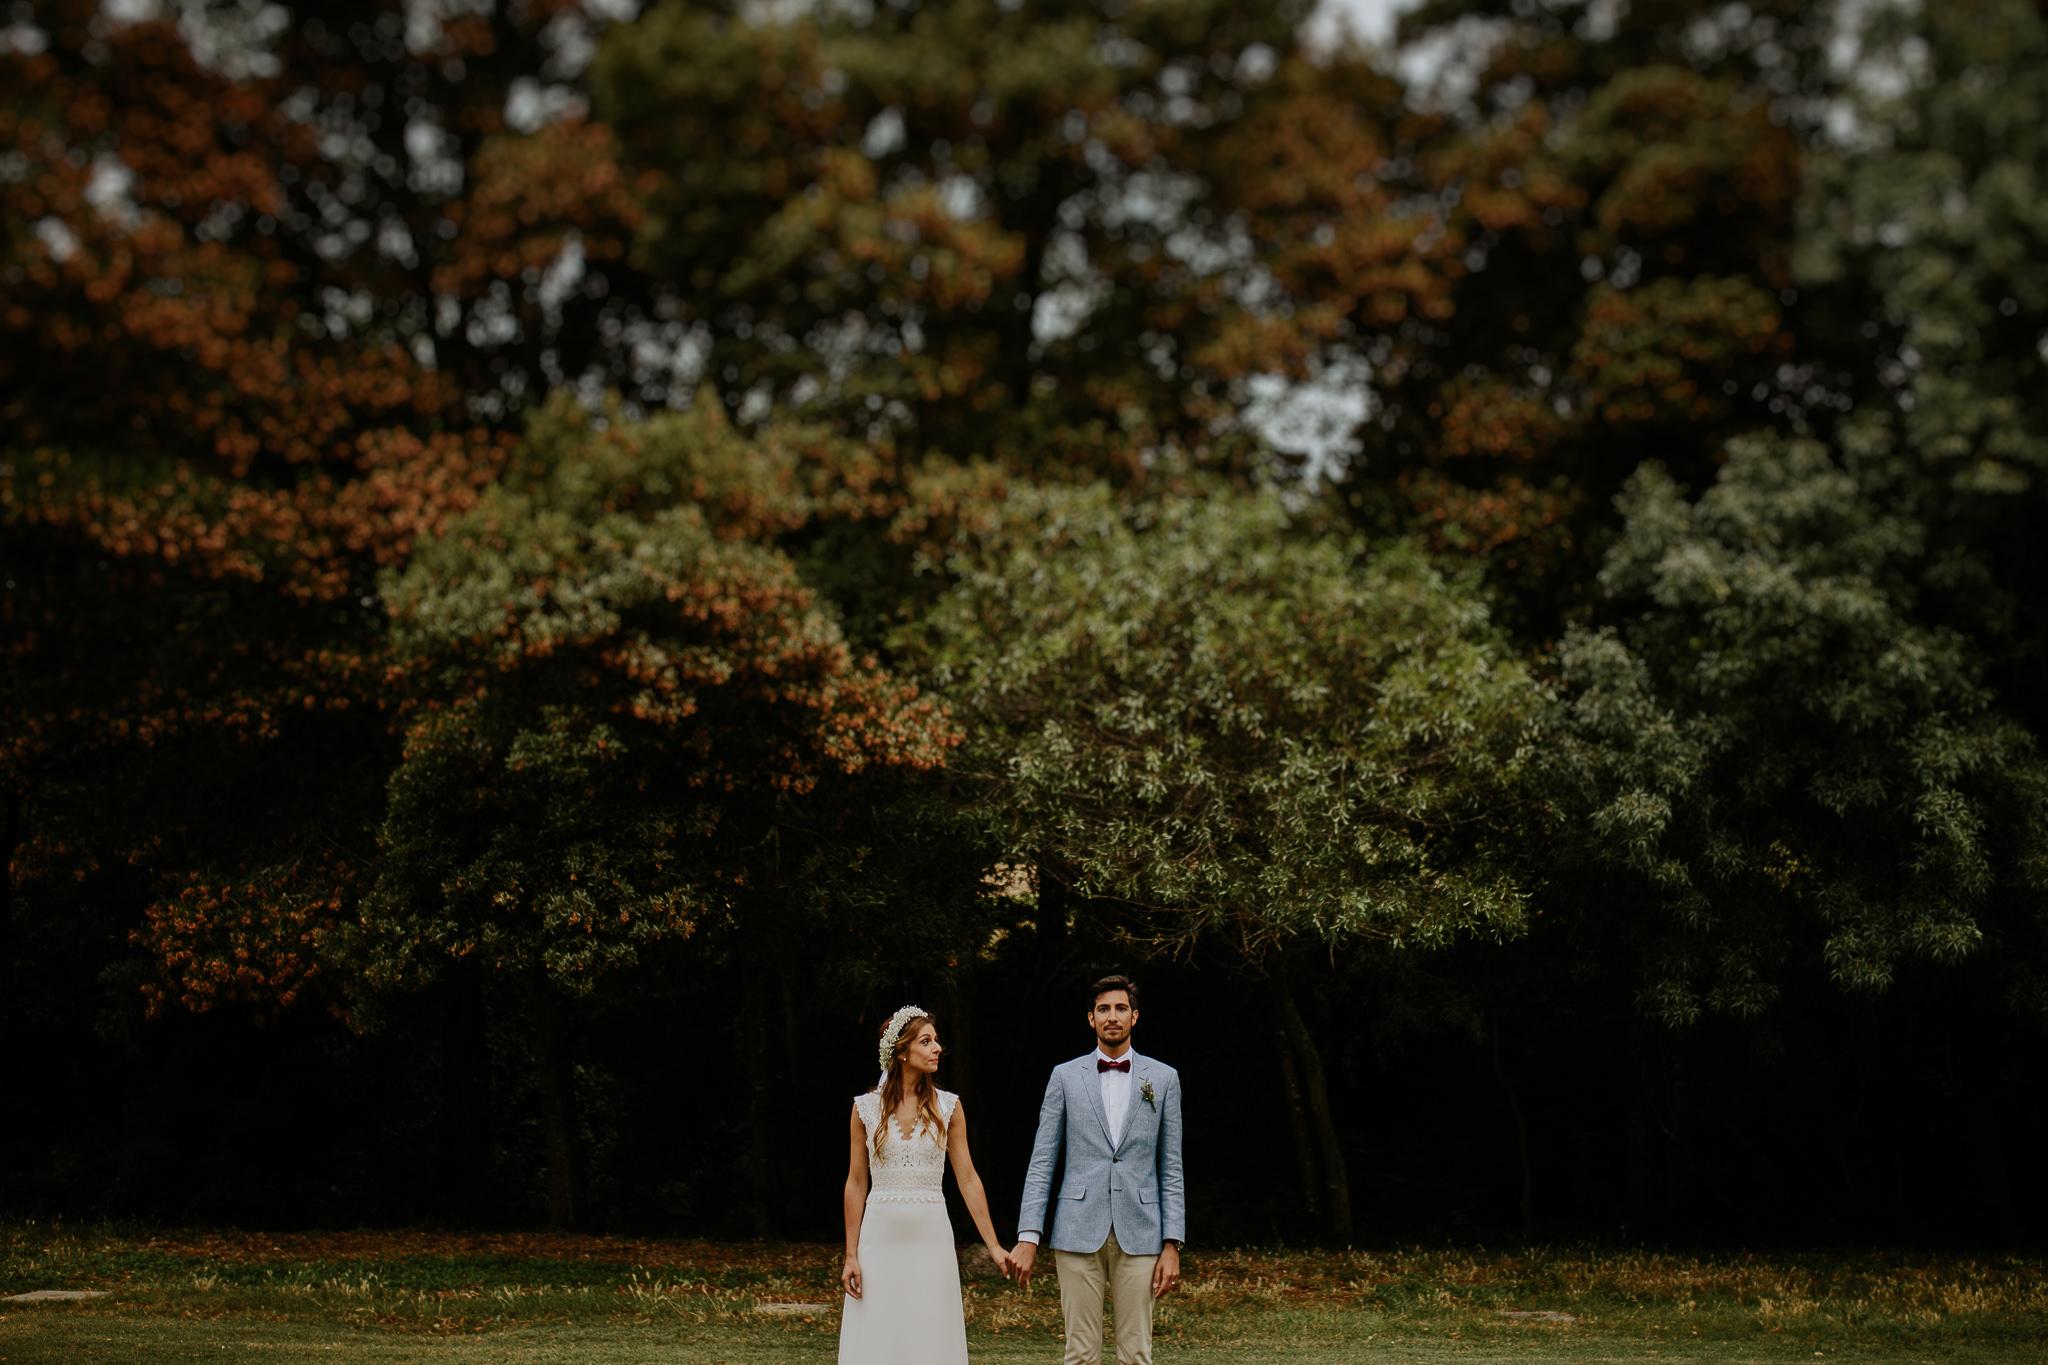 romina_thomas_destination_wedding_photography_fotografia_de_casamento_lisbon_sintra_penha_longa_resort-1